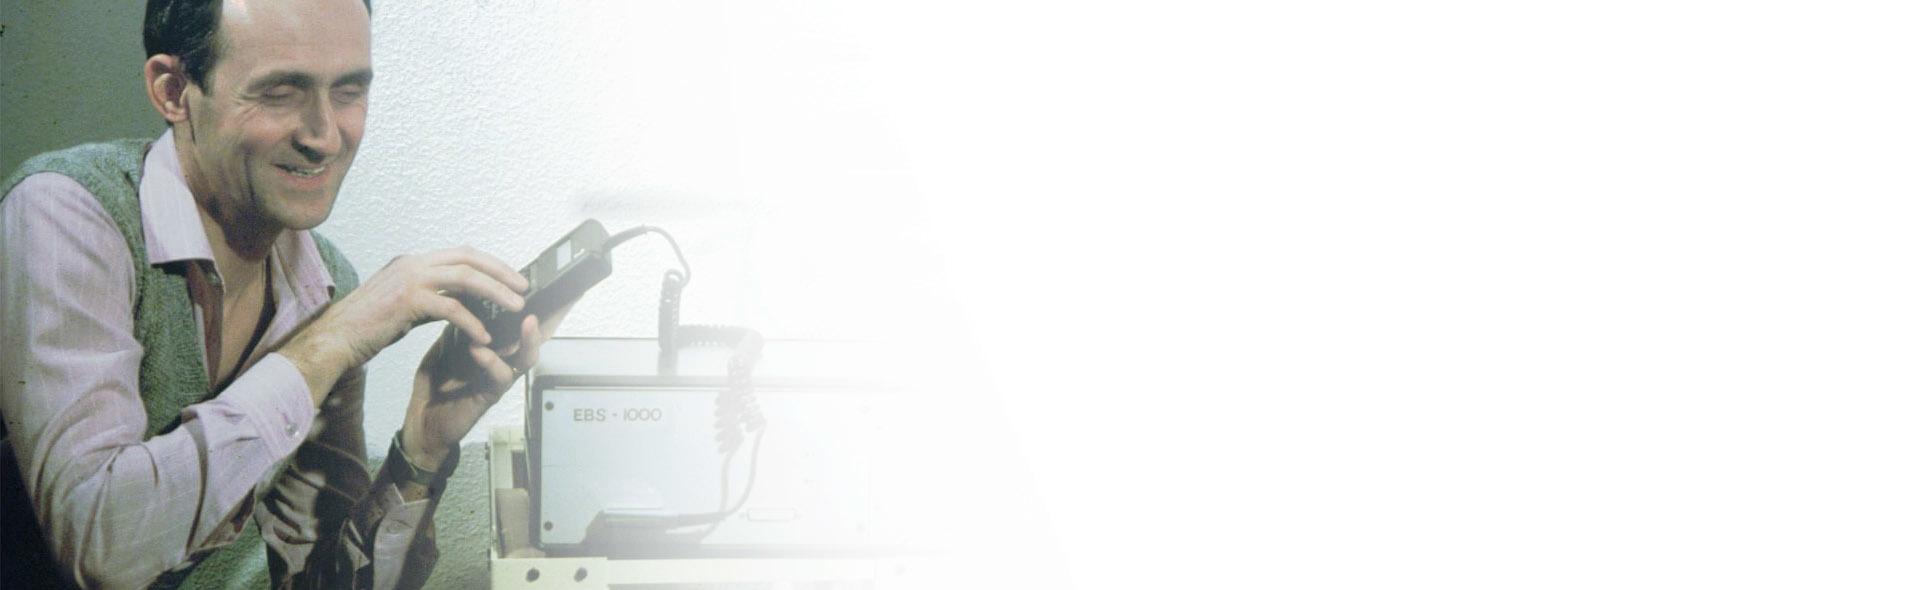 Profil firmy - content